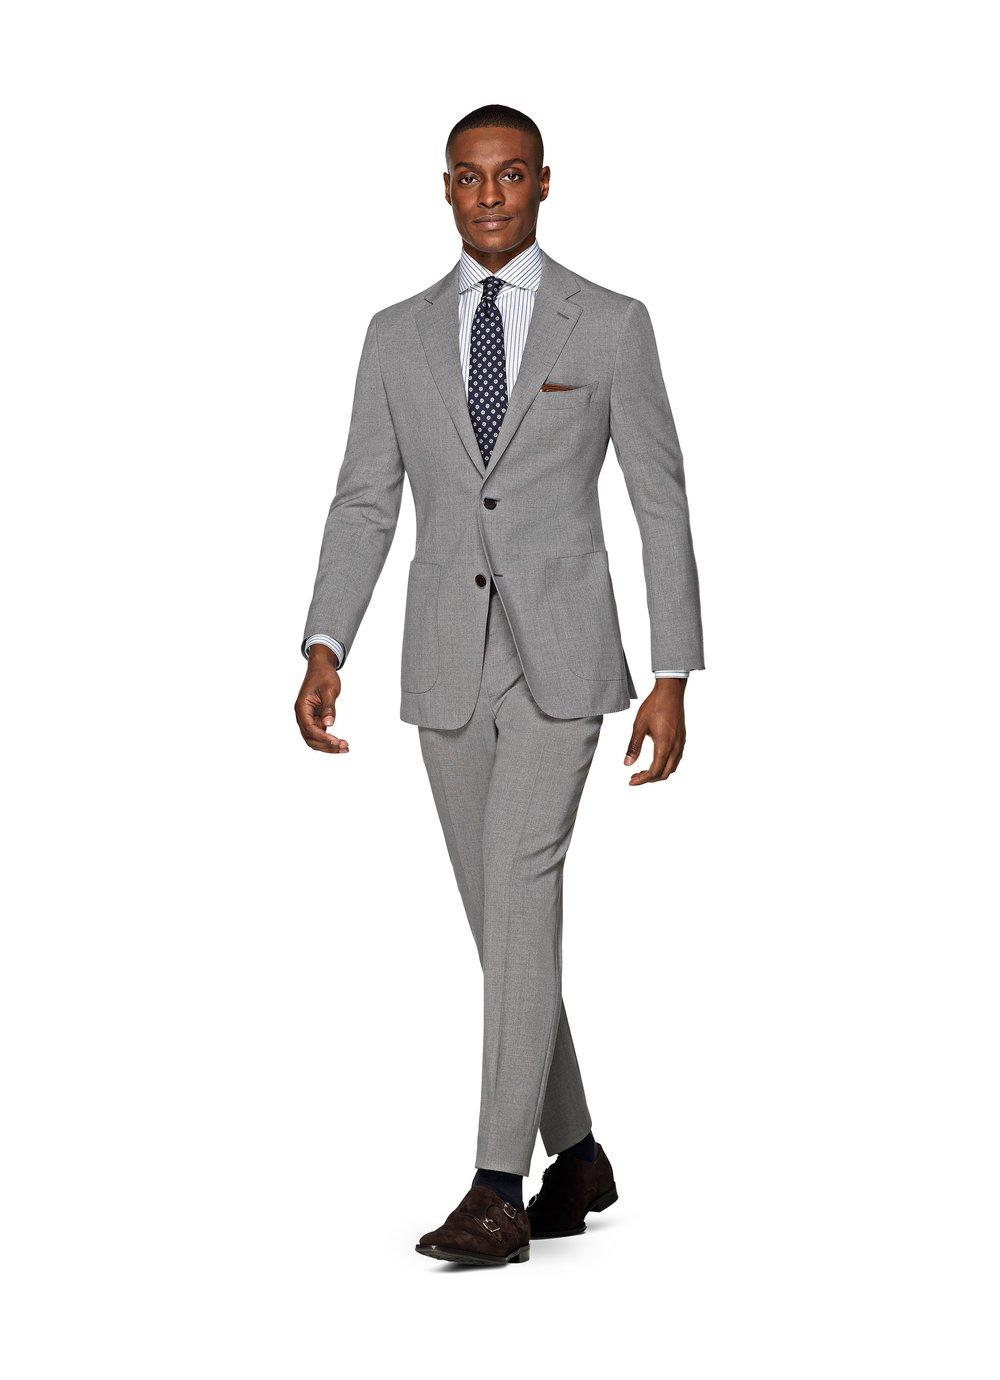 Suits_Light_Grey_Plain_Havana_Traveler_Unlined_P5184_Suitsupply_Online_Store_10.jpg